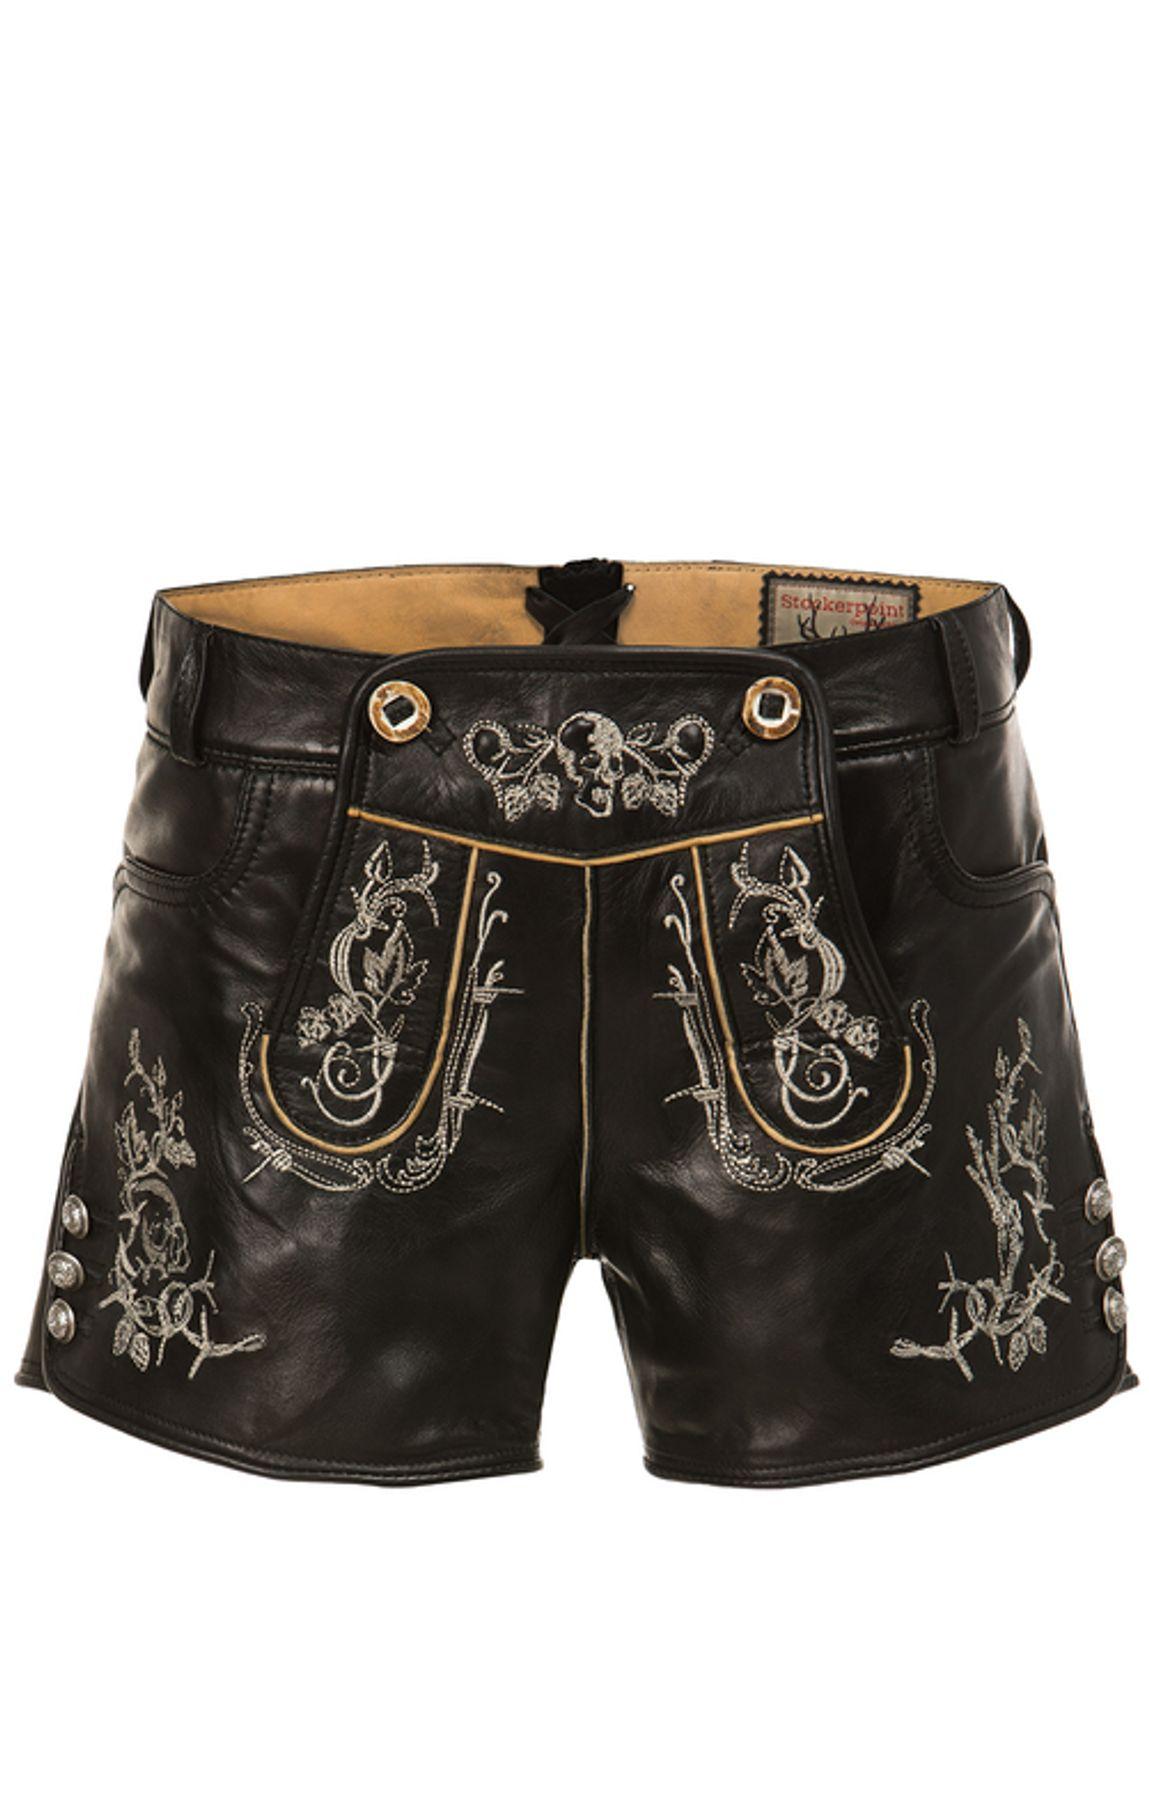 Stockerpoint - Damen Trachten Lederhose kurz, Jary – Bild 3